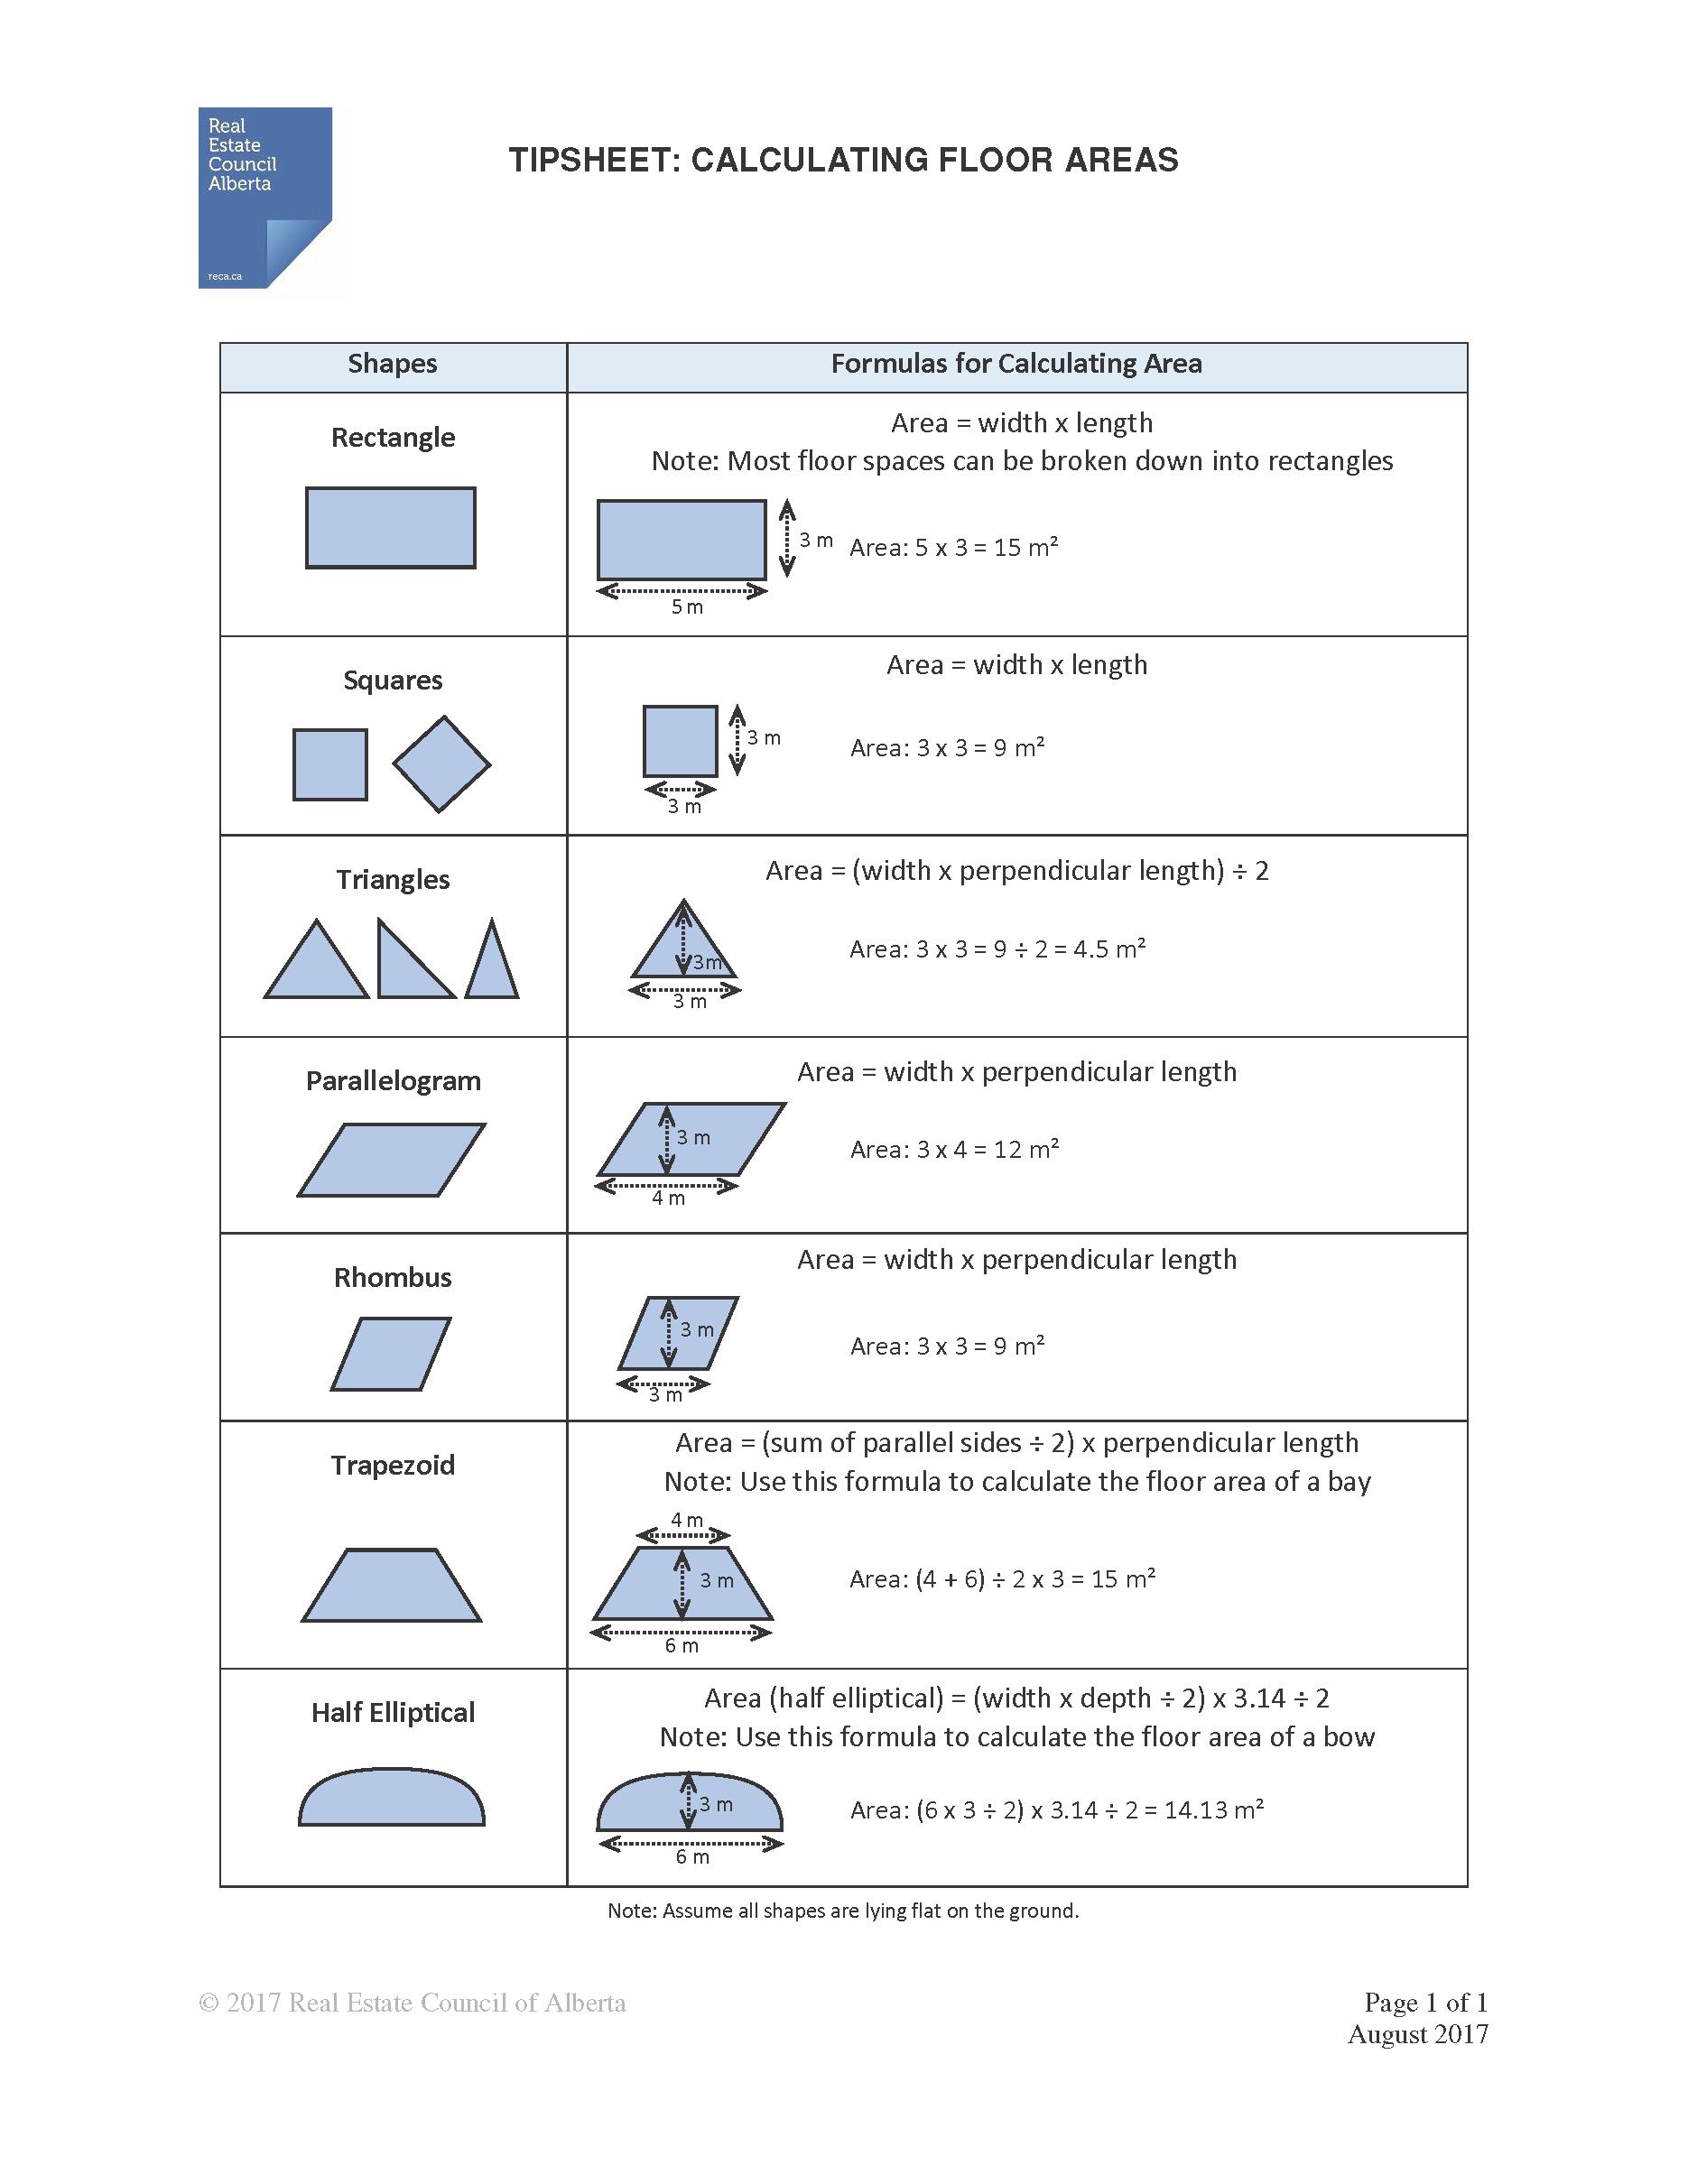 Residential Measurement Standard tipsheet to calculate floor plans